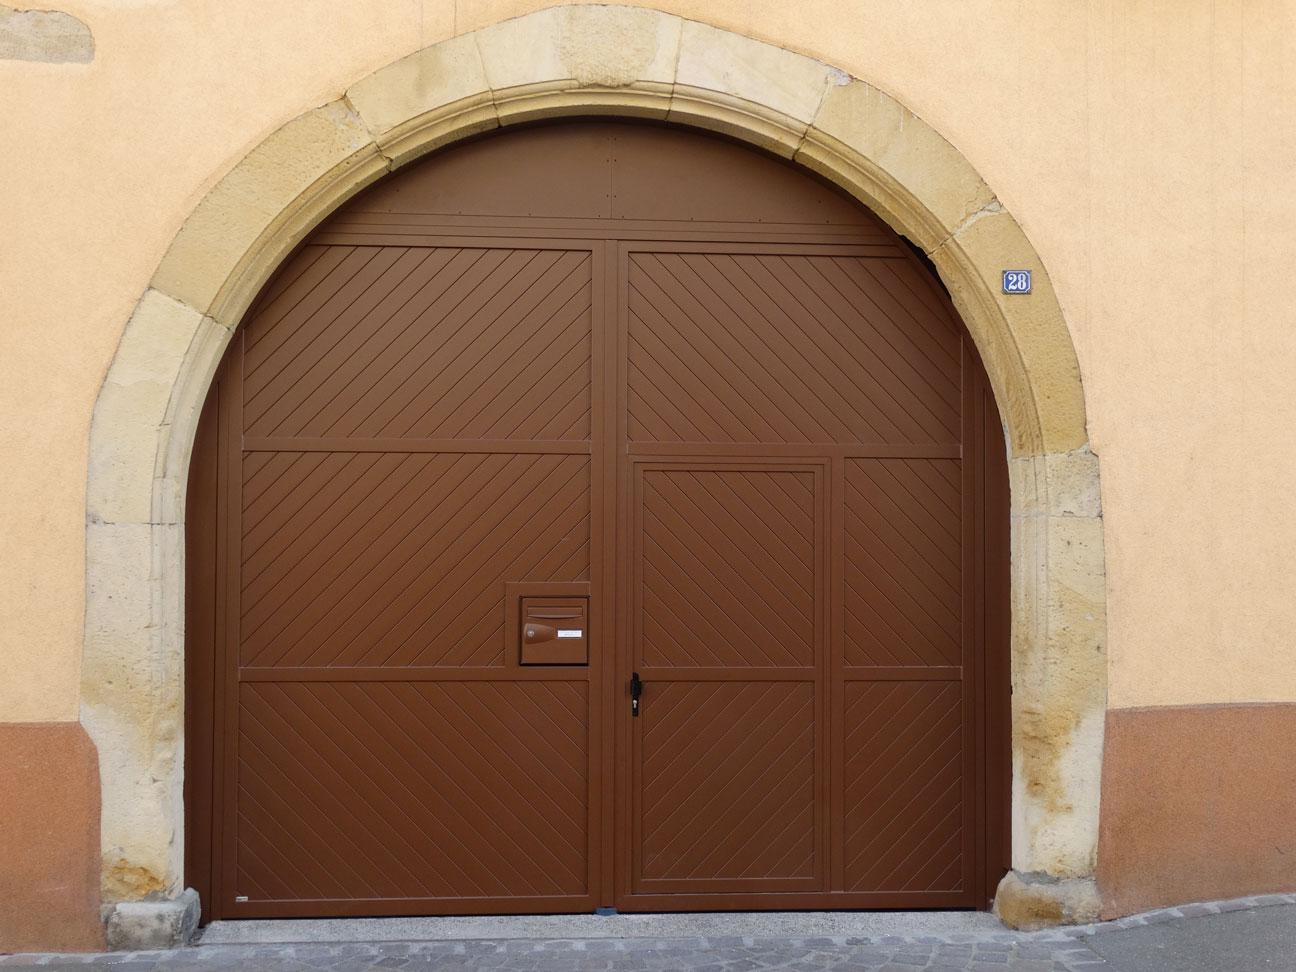 Porte d 39 entr e aluminium guebwiller haut rhin 68 for Porte garage haut rhin